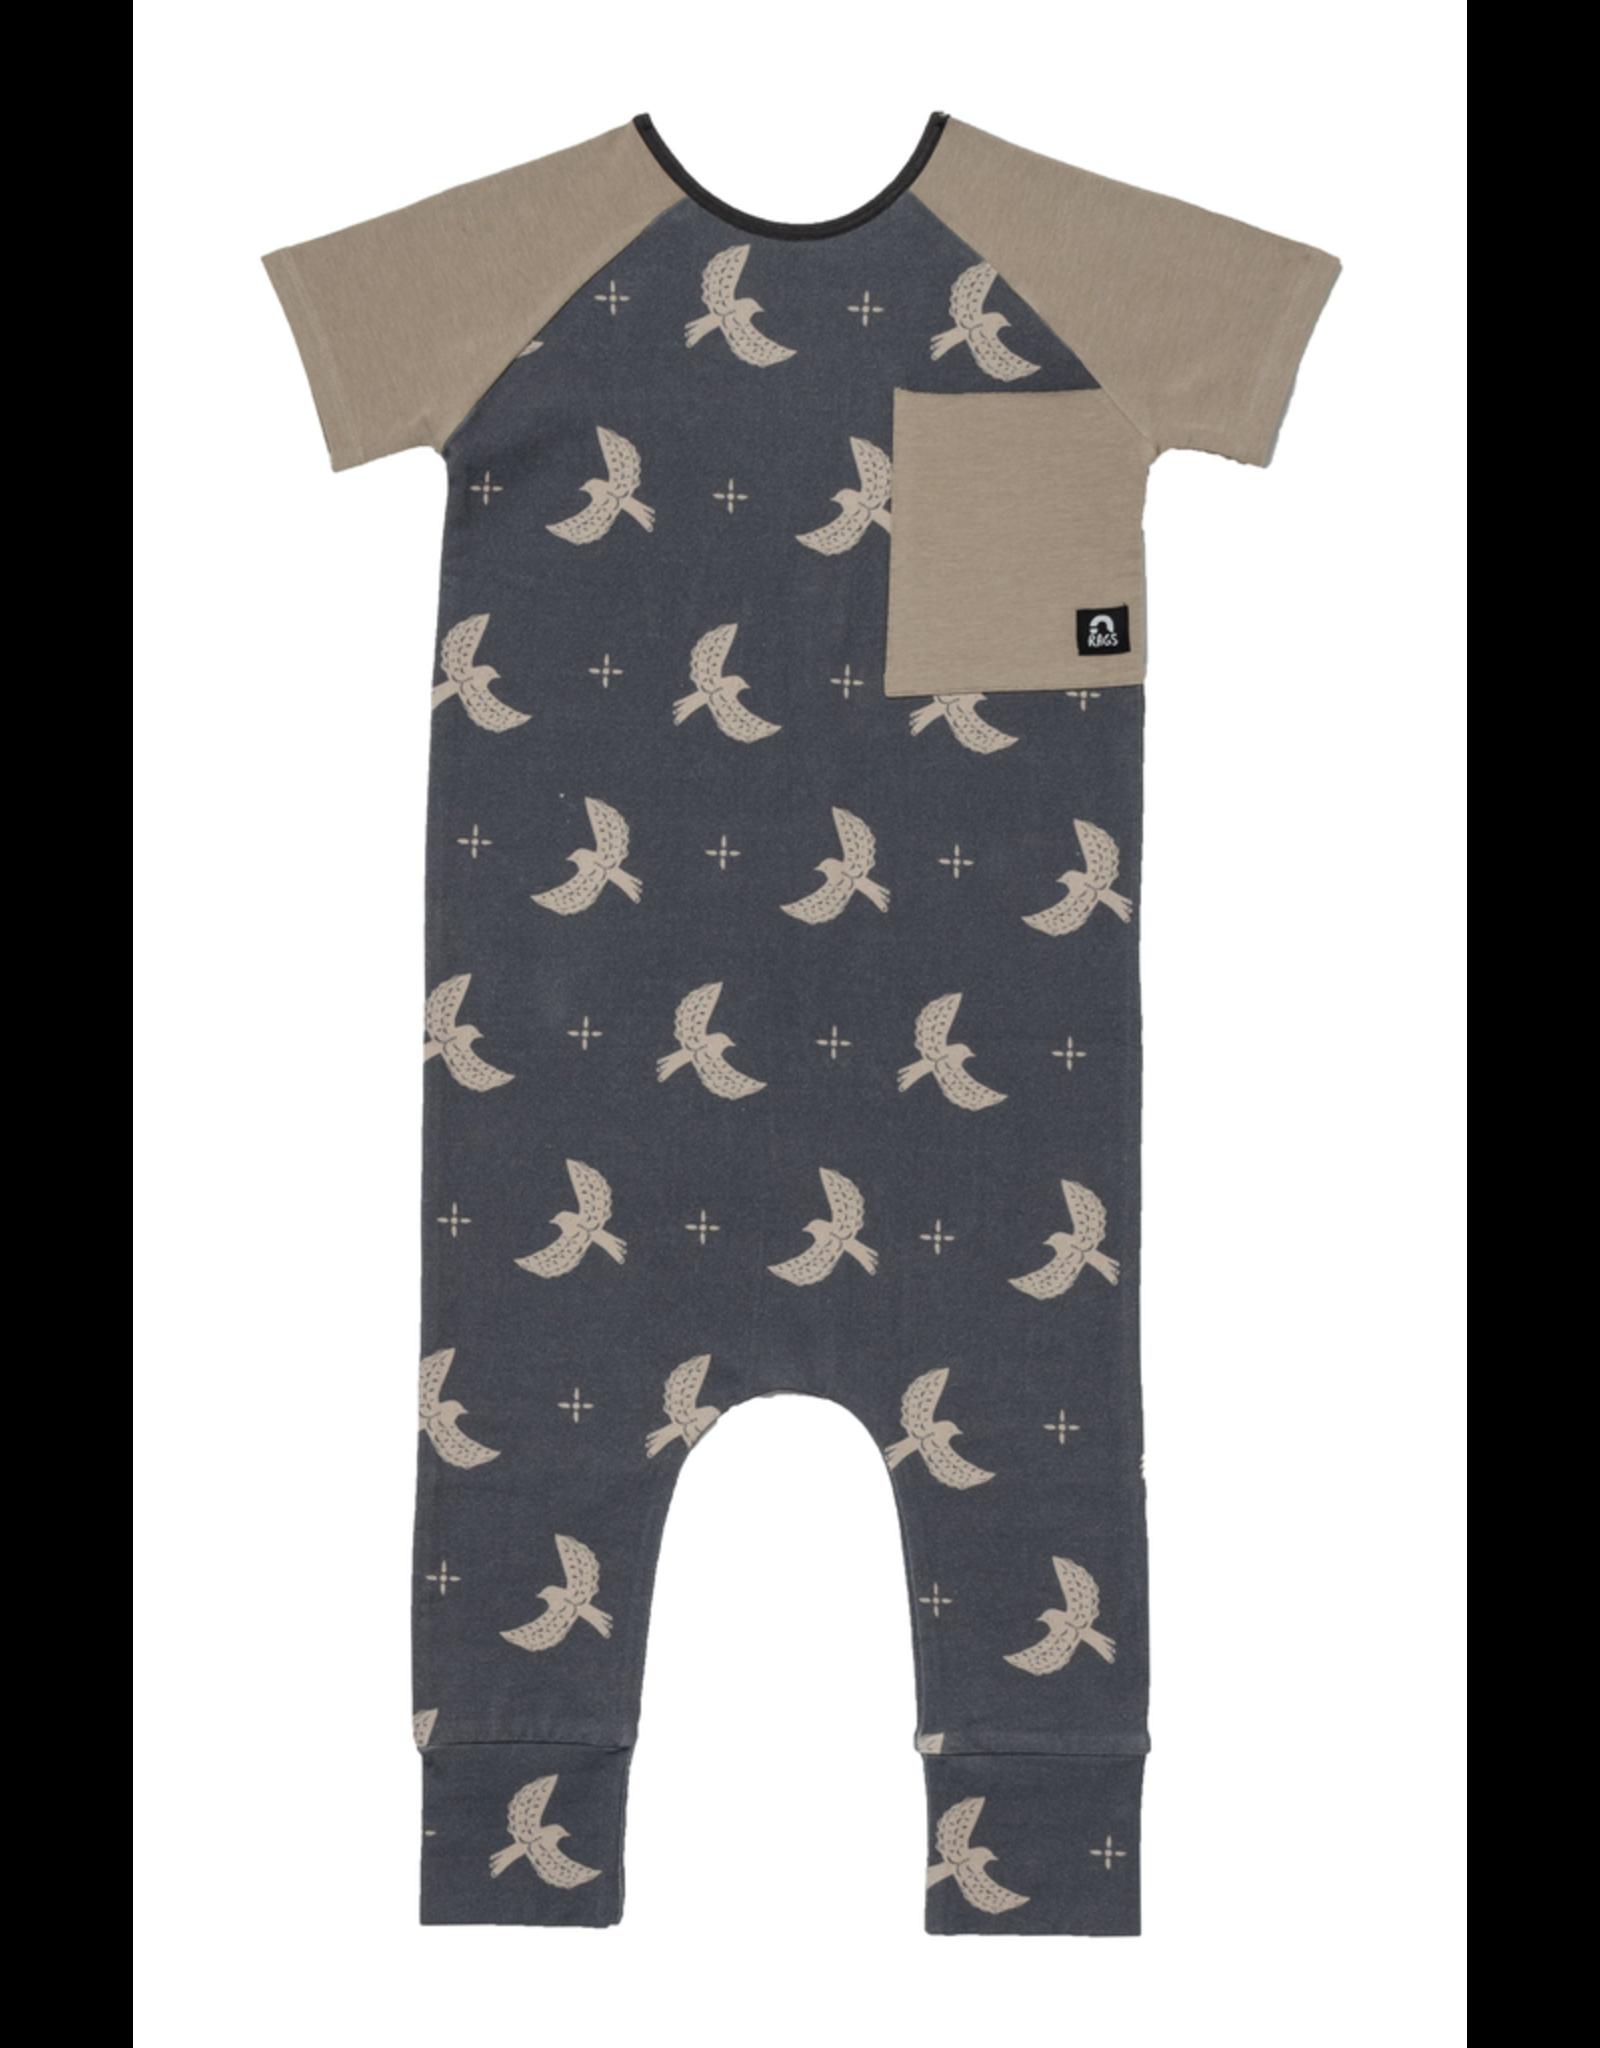 rags rags to raches short sleeve raglan birds